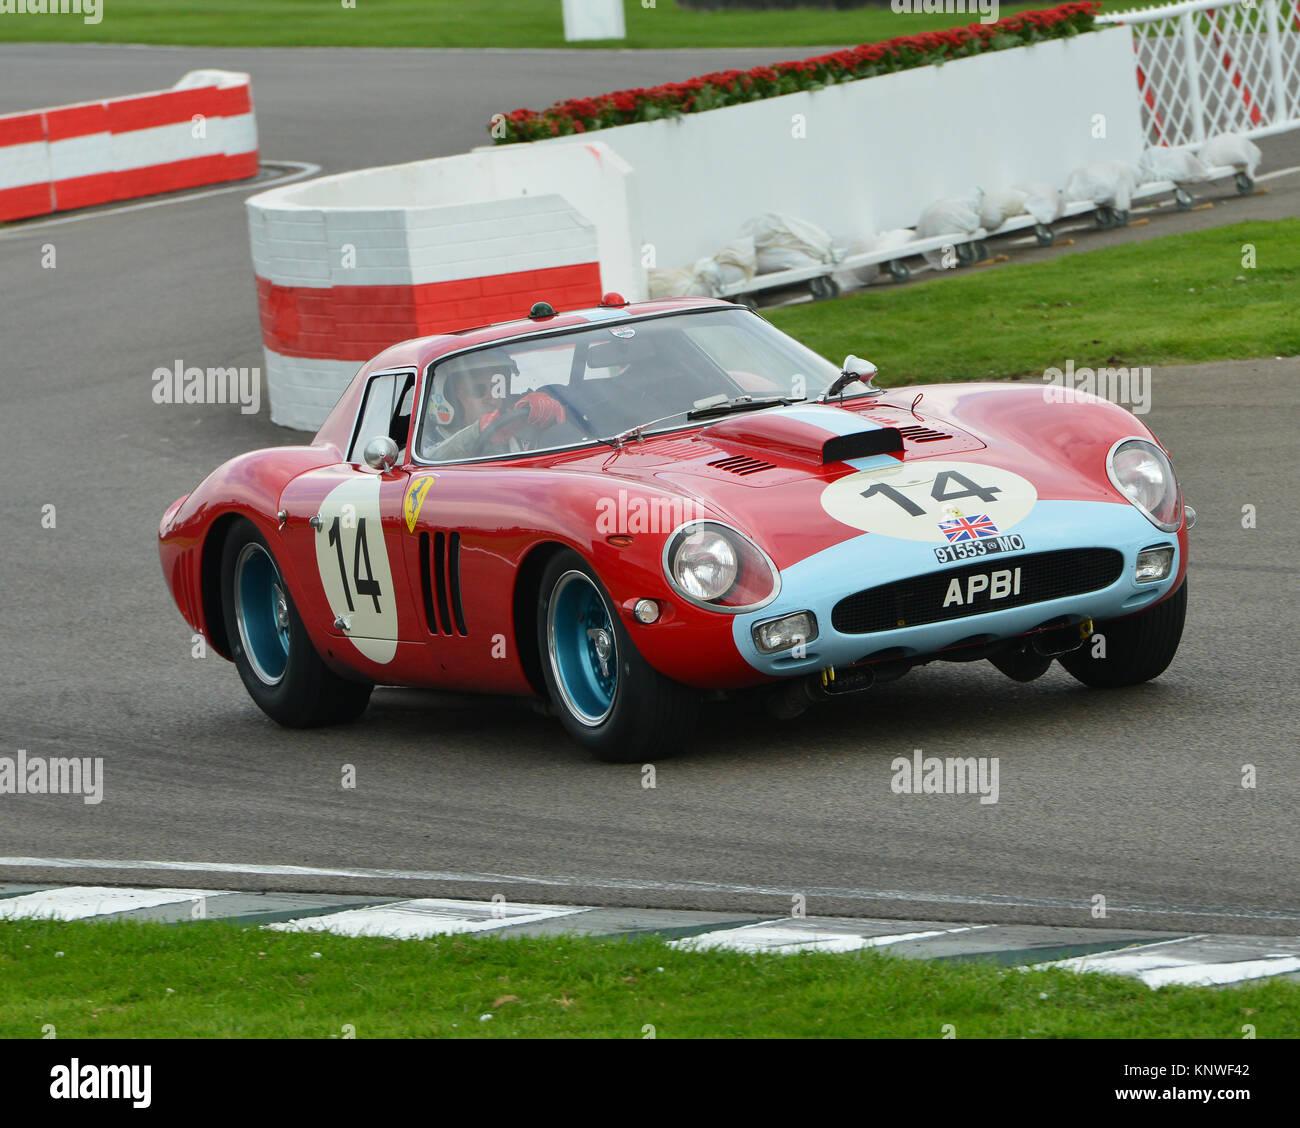 64 Gto Ferrari: 250 Gto Stock Photos & 250 Gto Stock Images